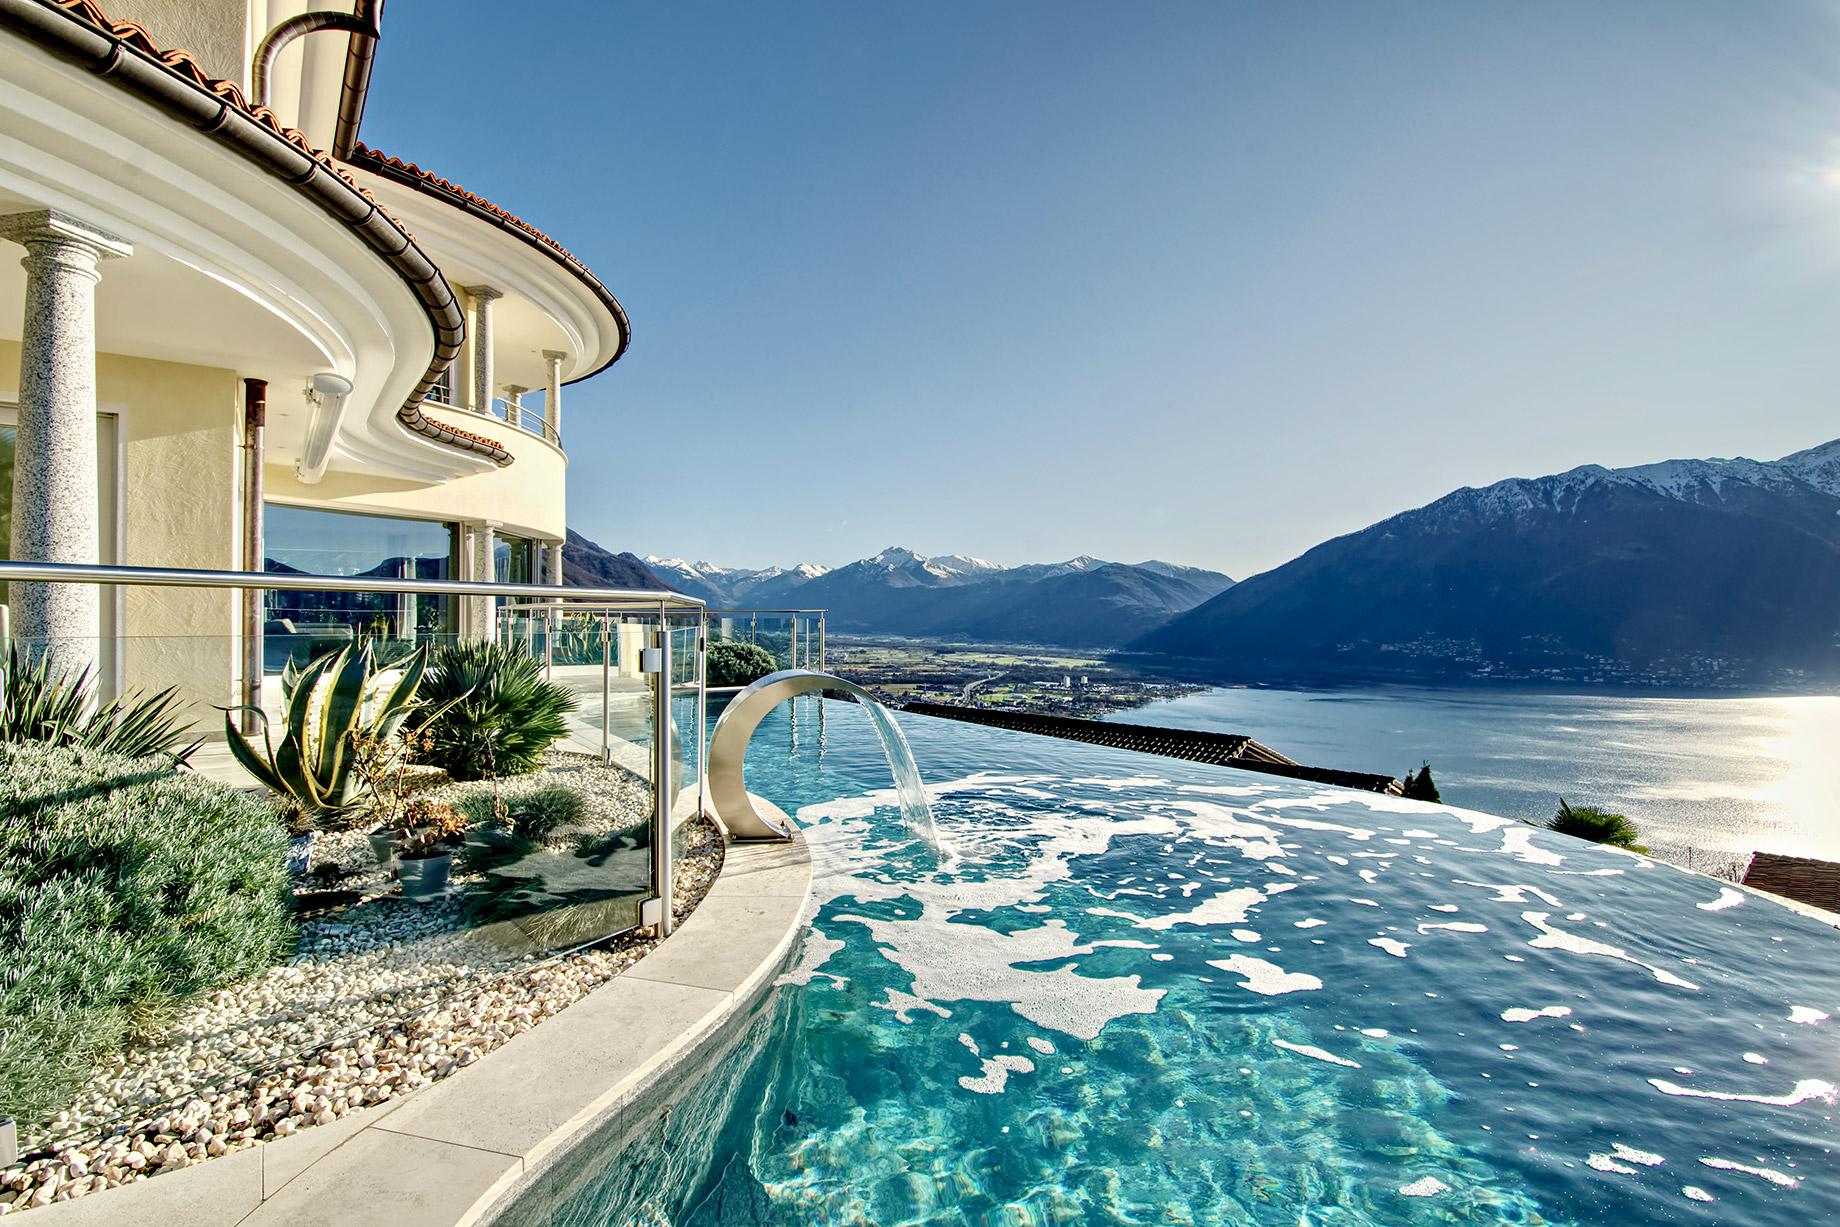 Brione Minusio Vonk Luxury Home - Lake Lugano - Ticino, Switzerland